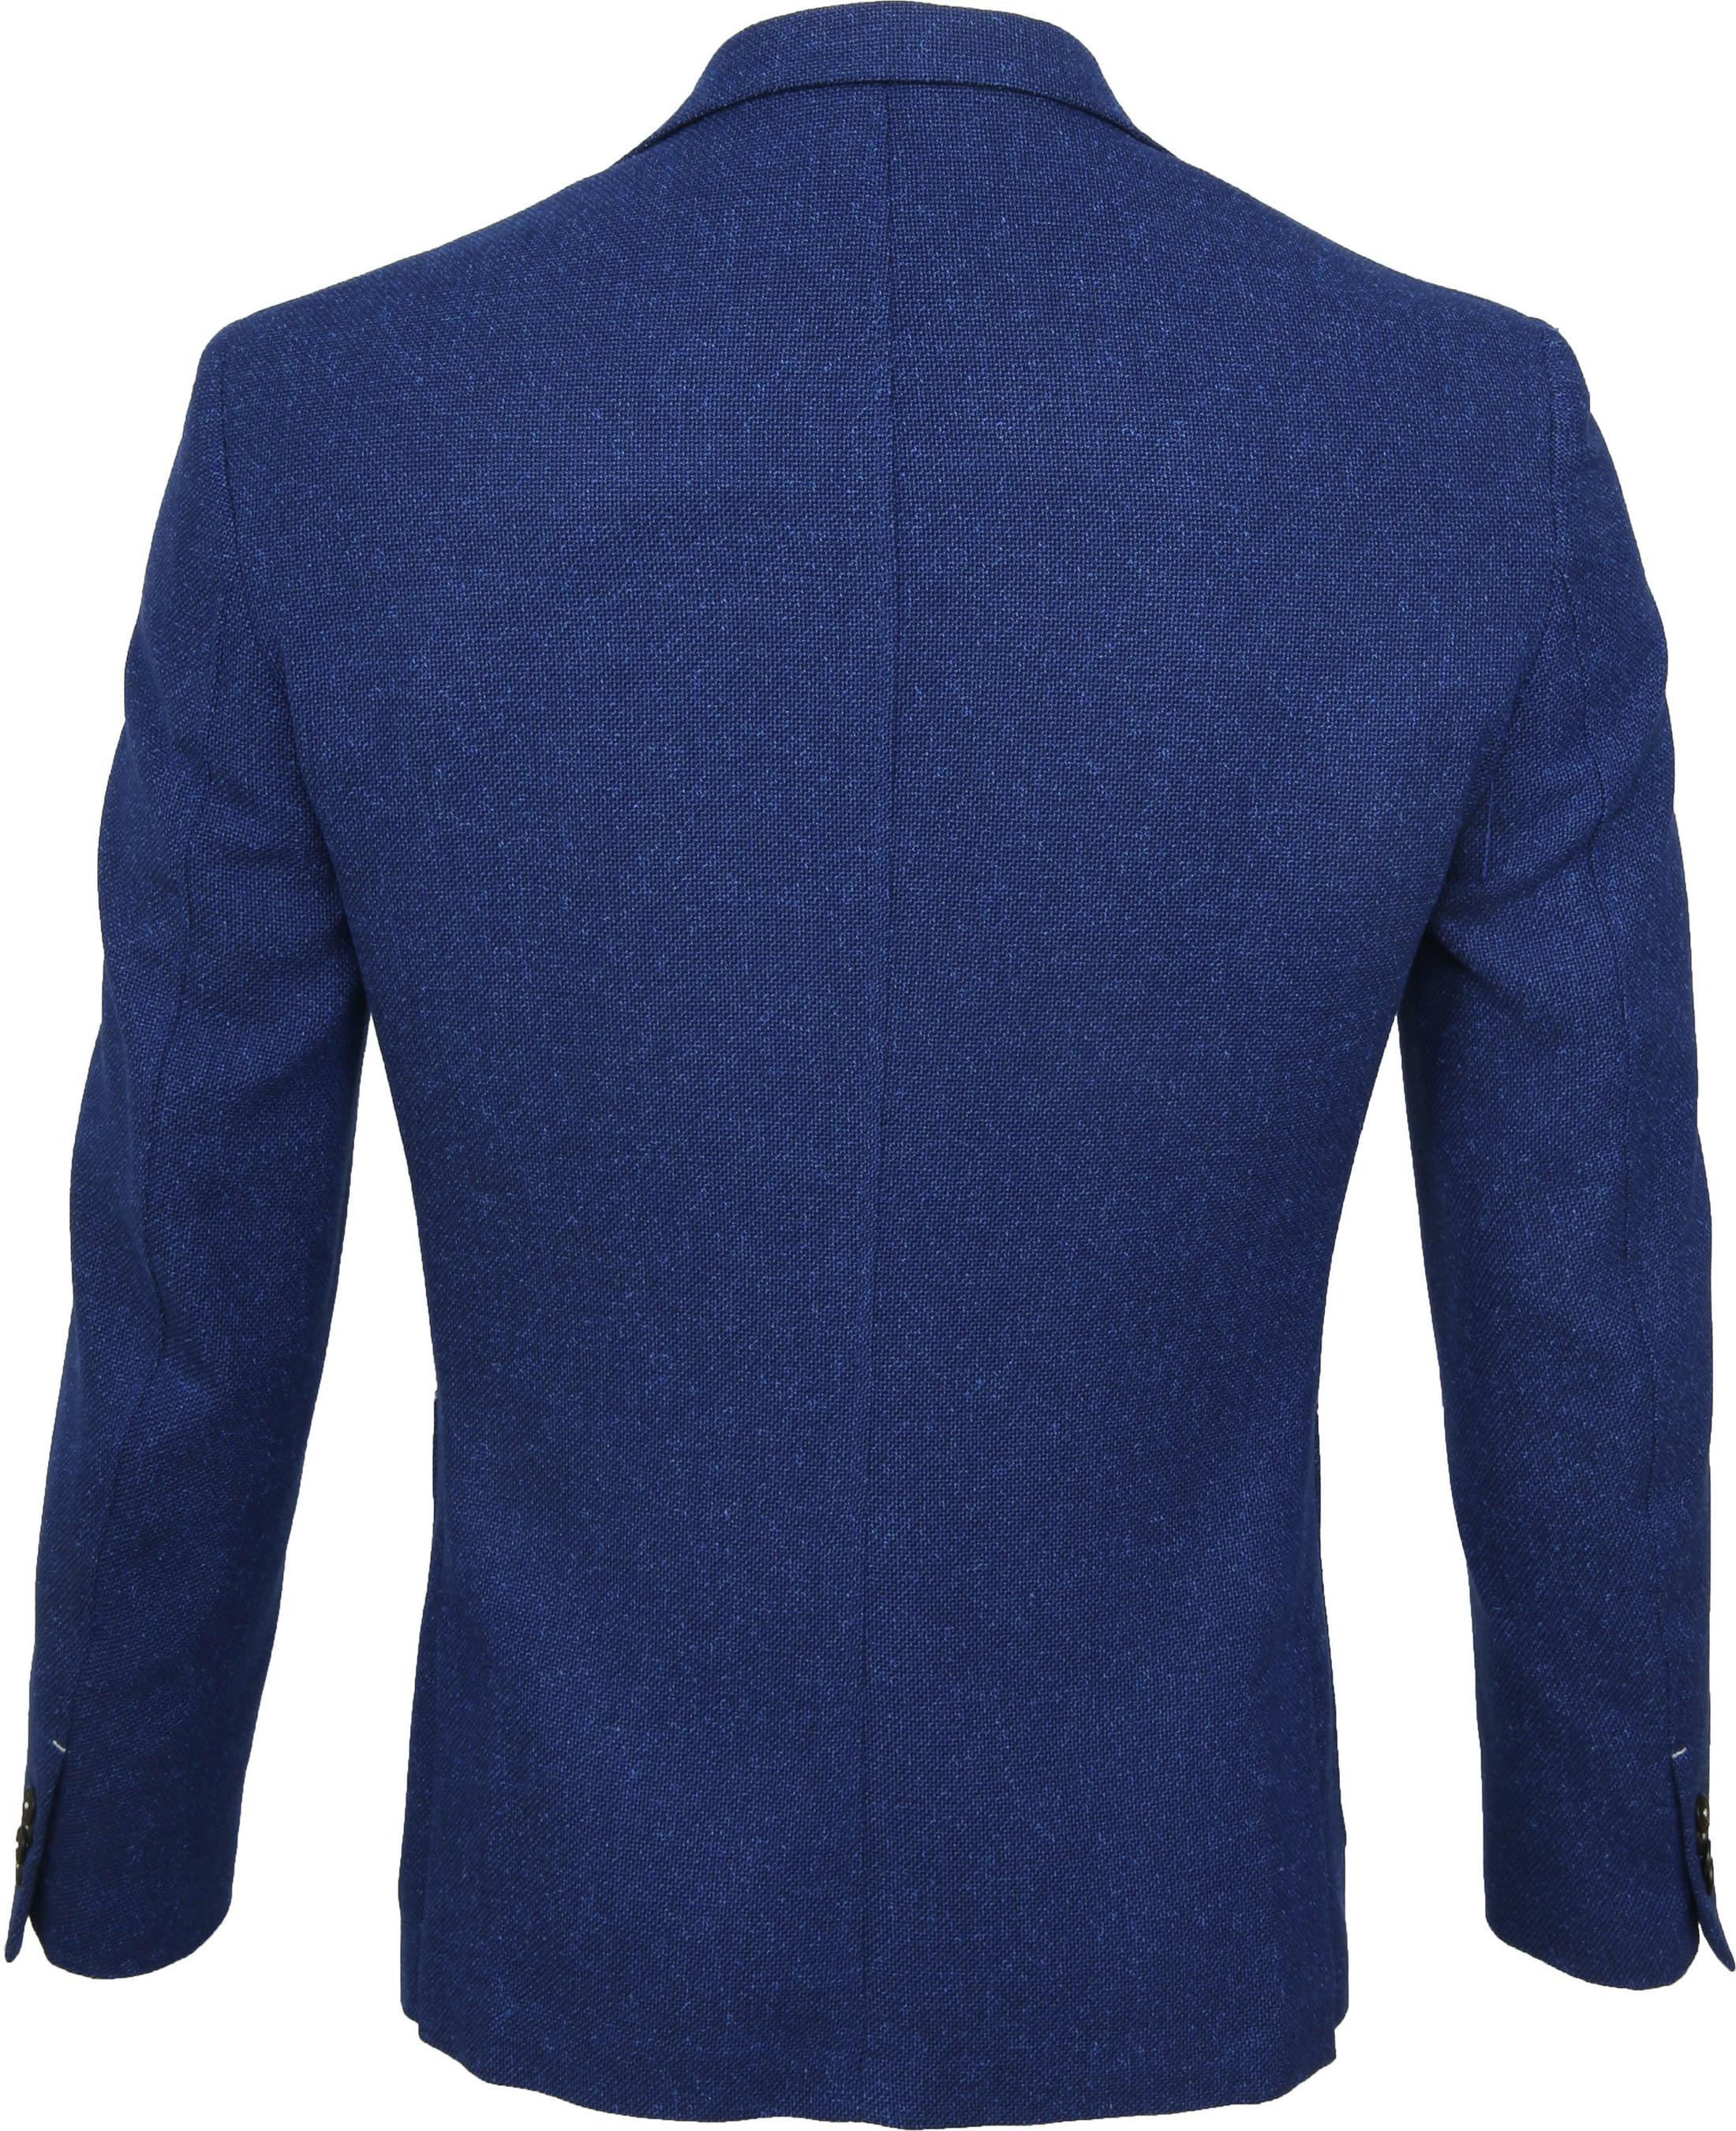 Suitable Blazer Pylos Blue foto 2